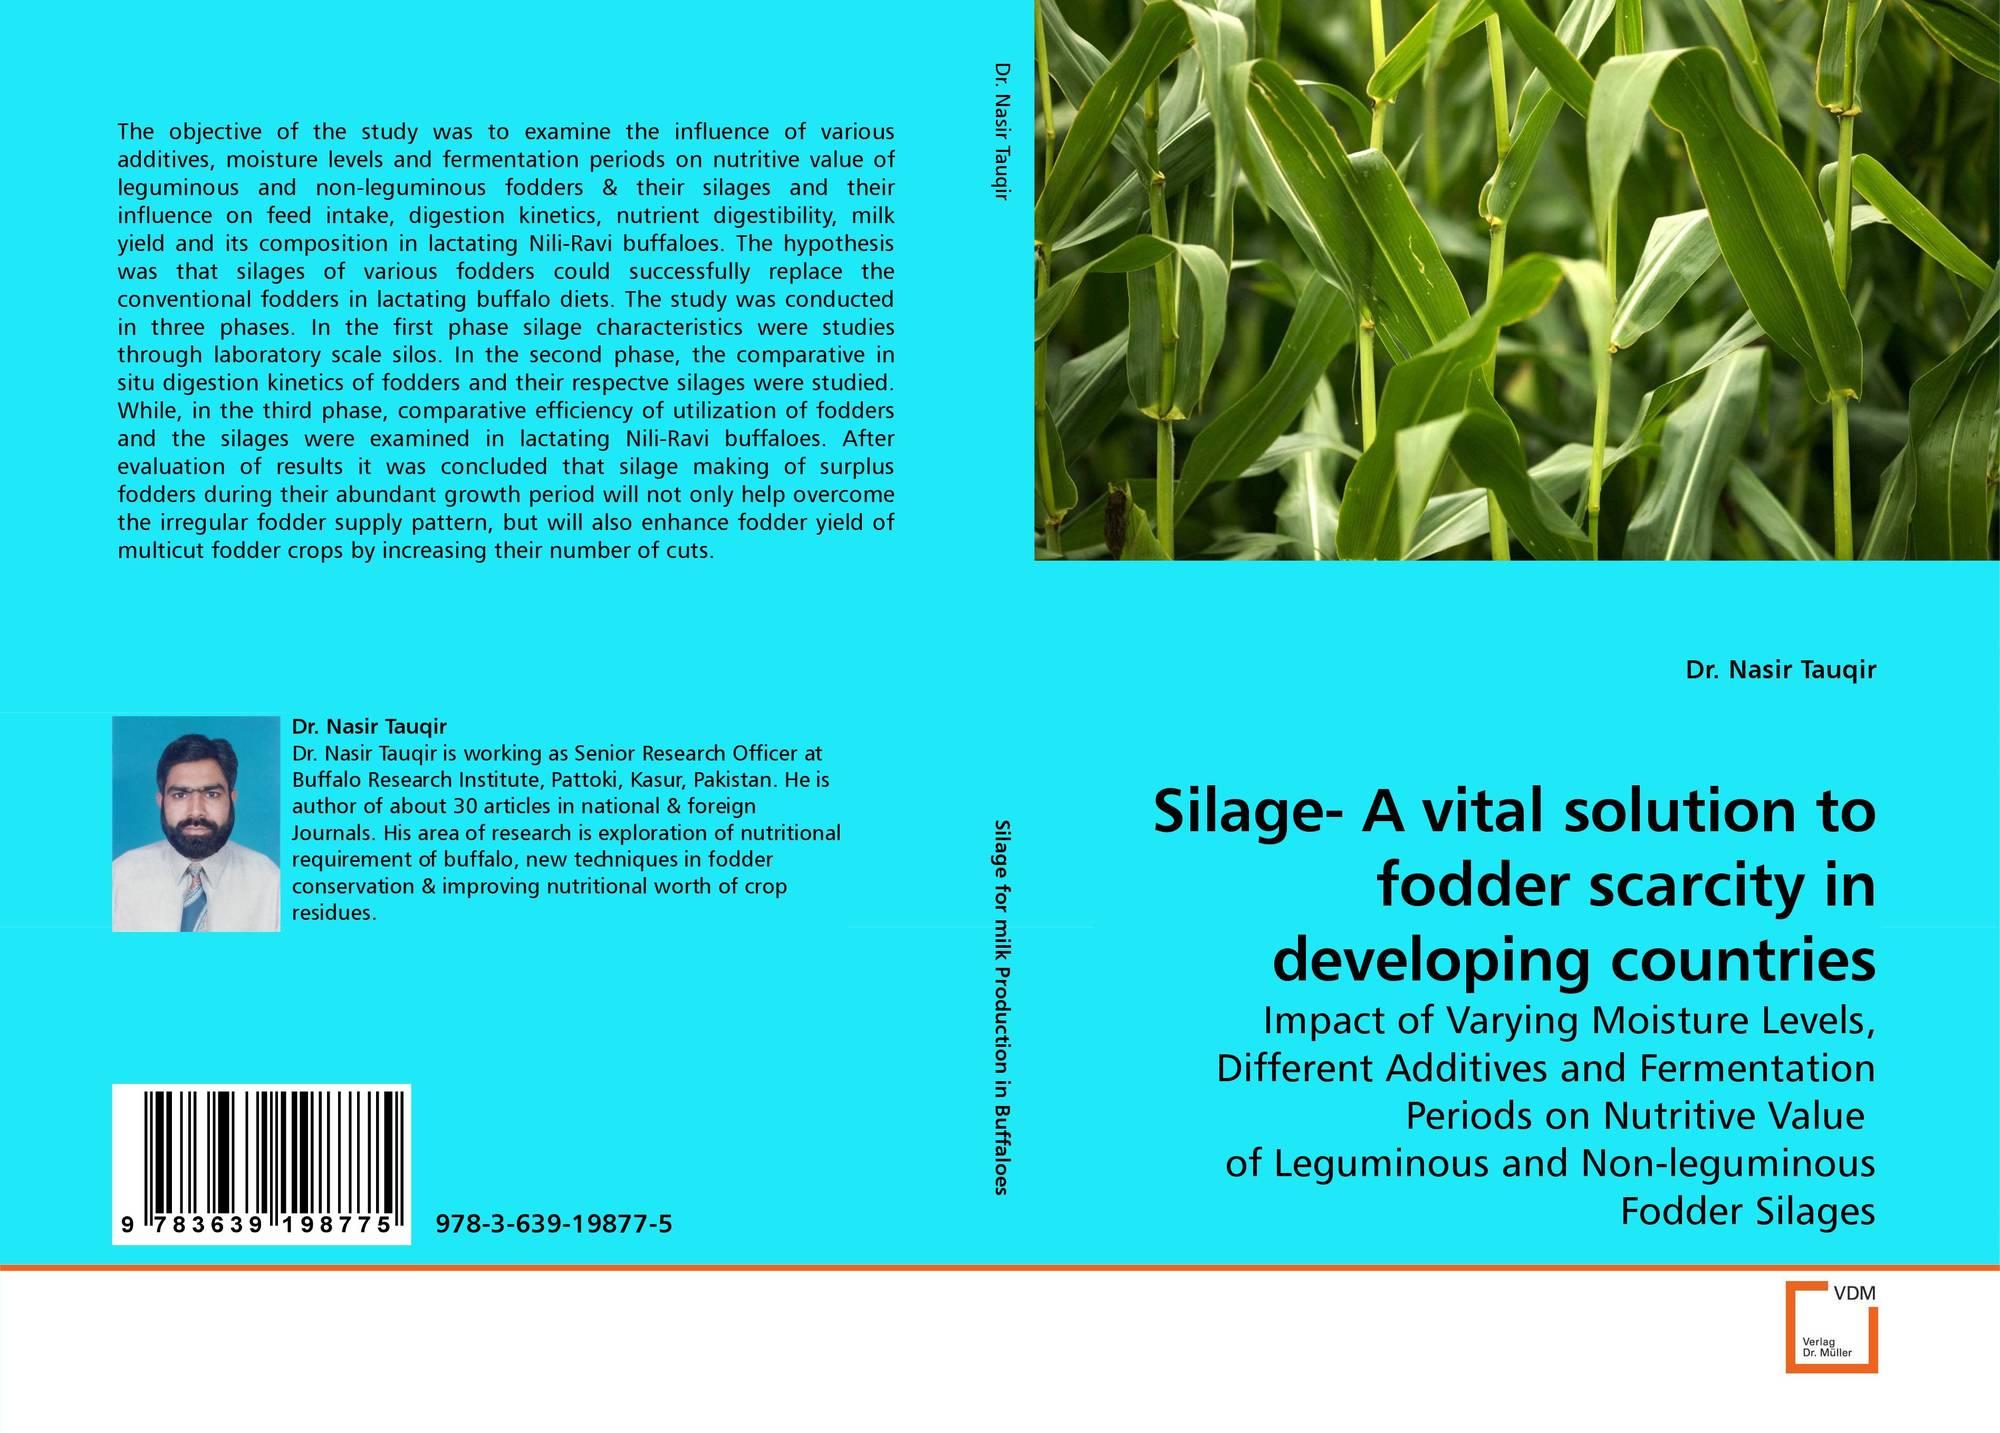 fodder scarcity in developing